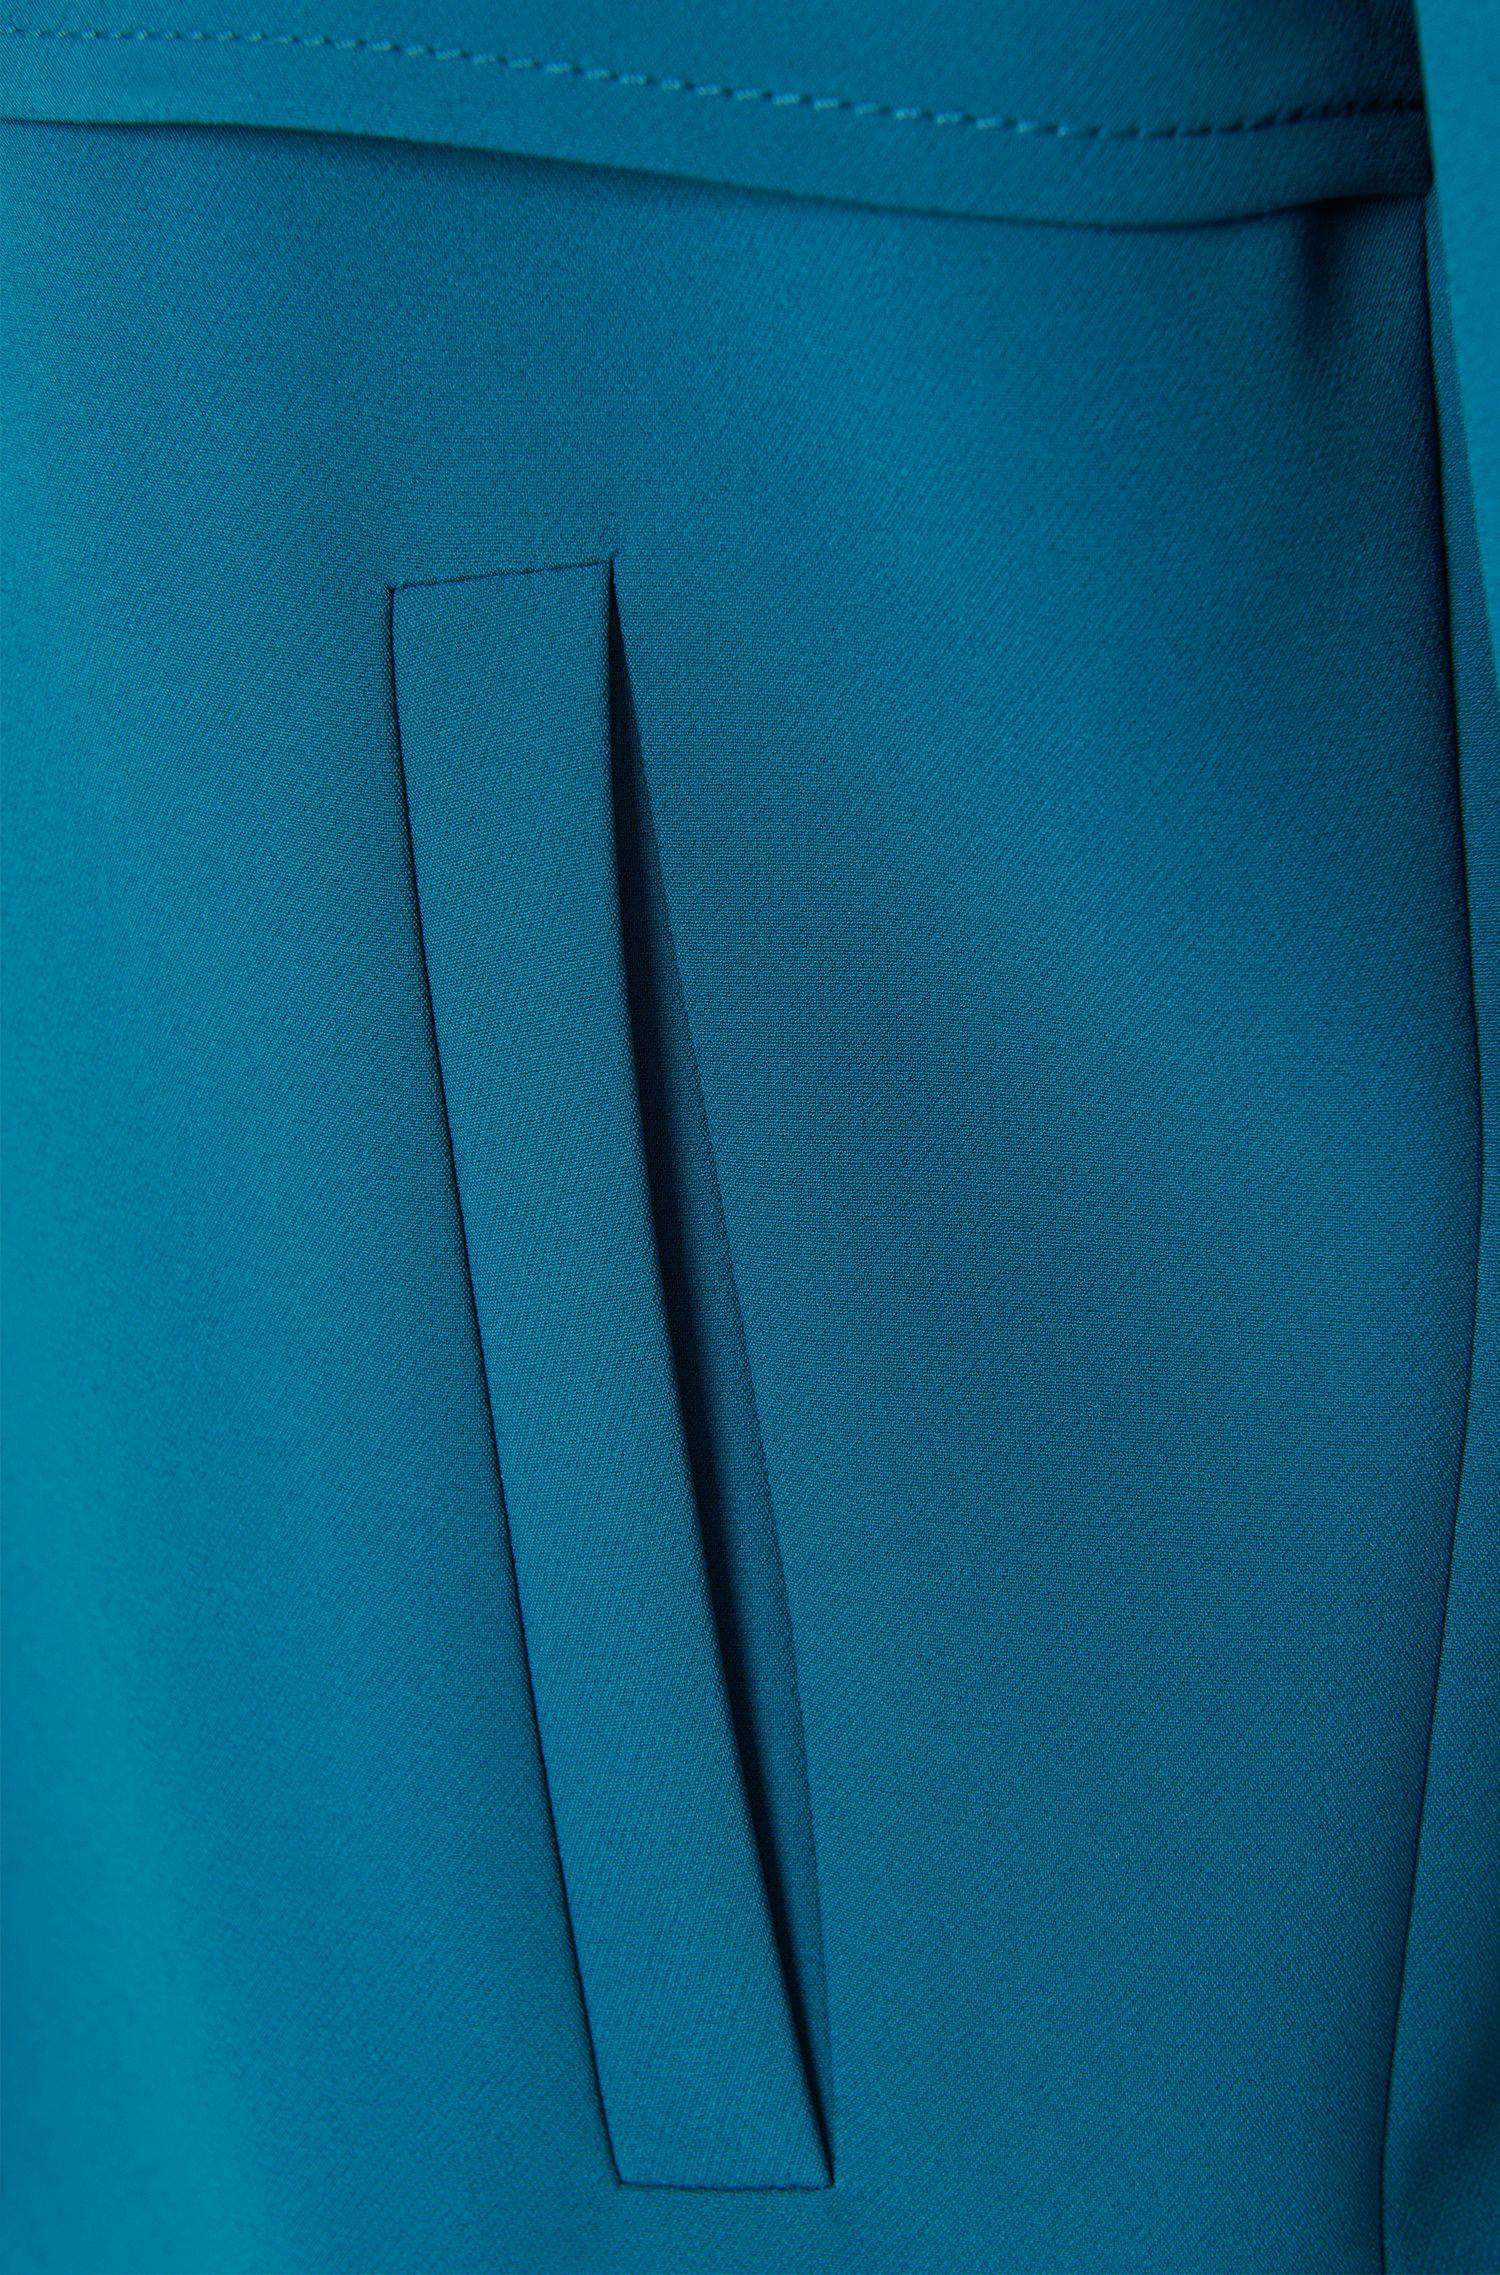 Gerade geschnitter Kurzblazer mit Schulterkoller: 'Aneis'